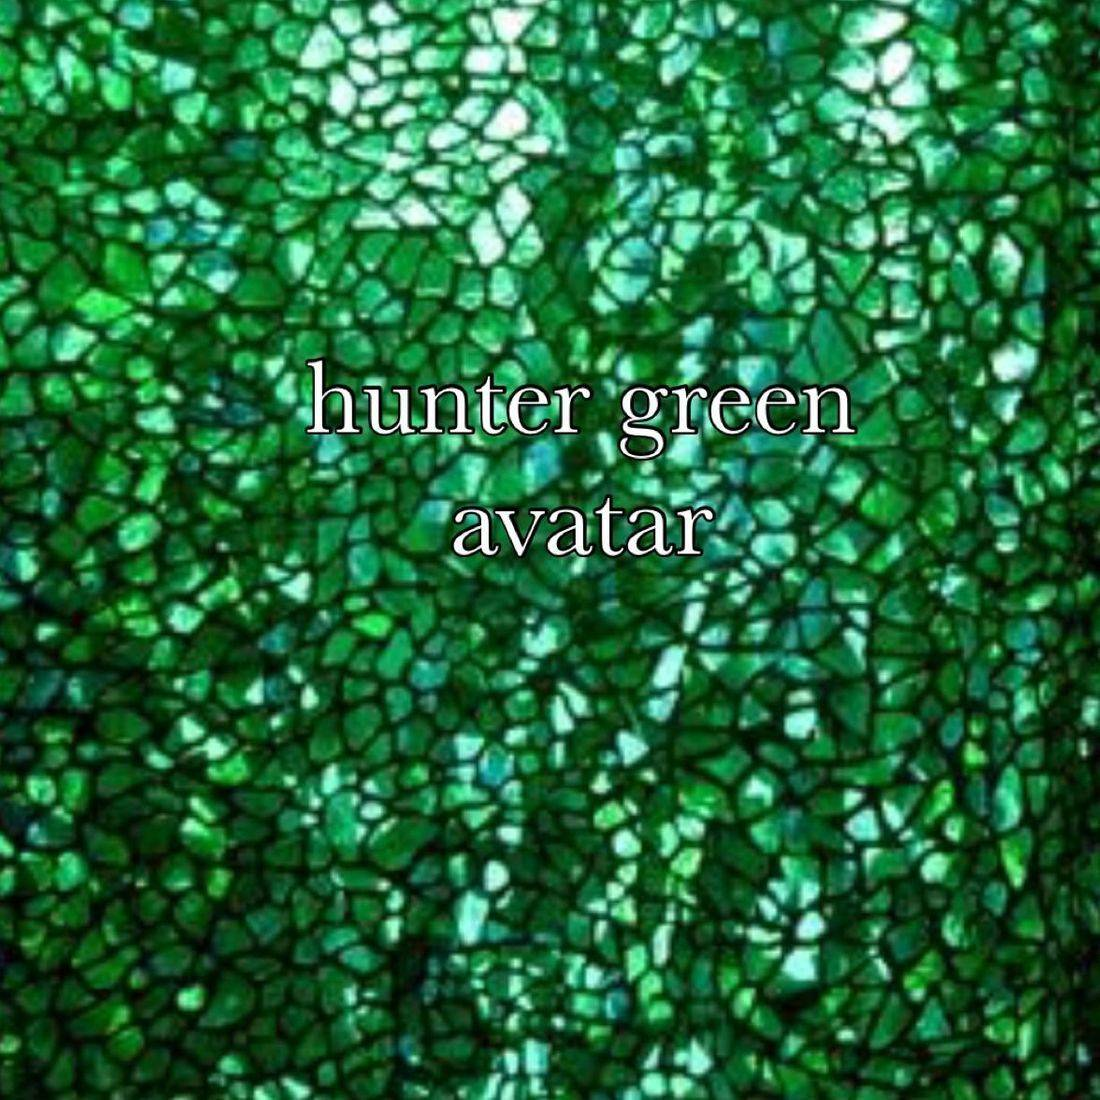 Hunter green avatar